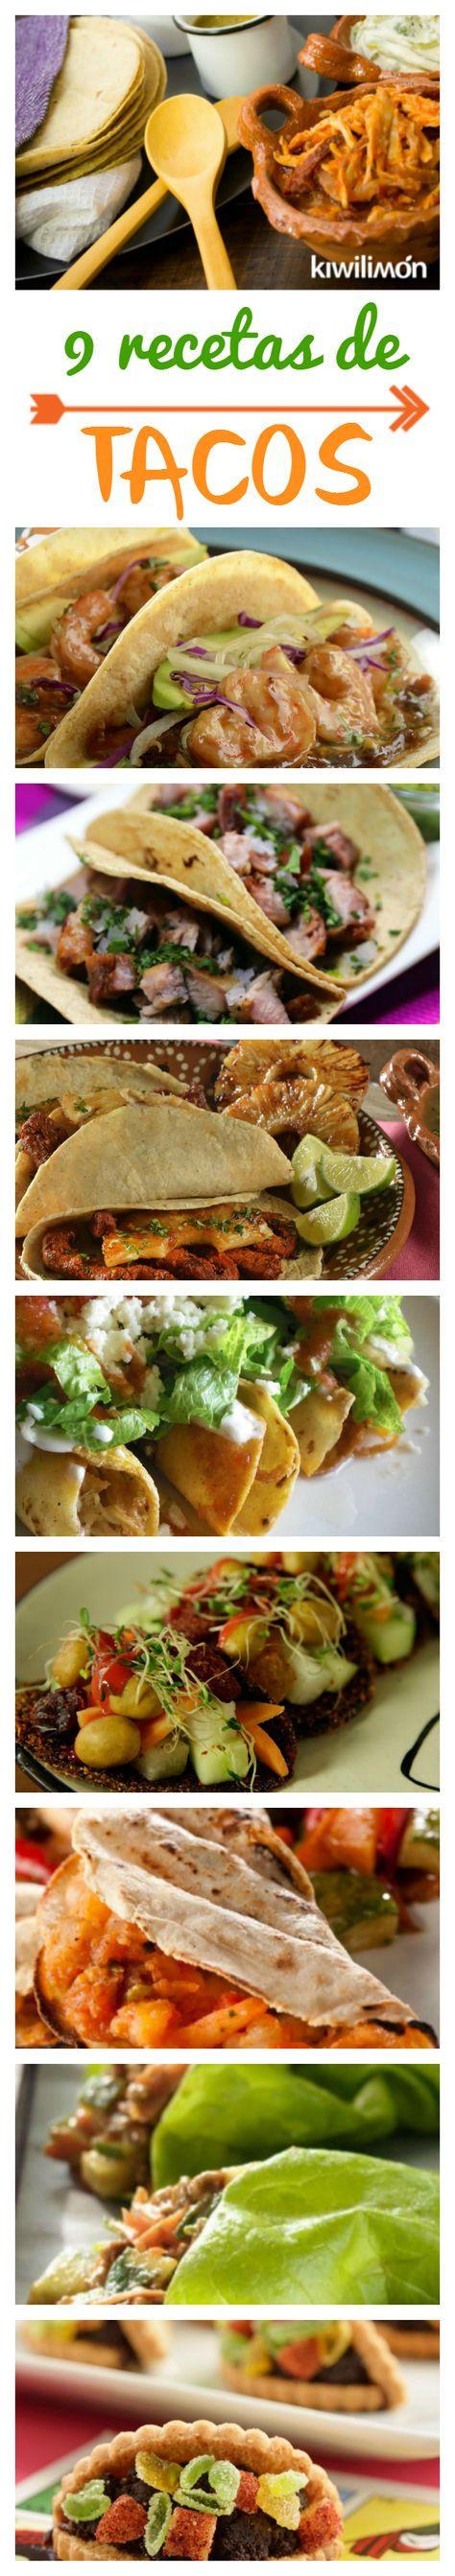 Araceli Playa Porno Iputas 181 best mexico: food images | food, mexican food recipes